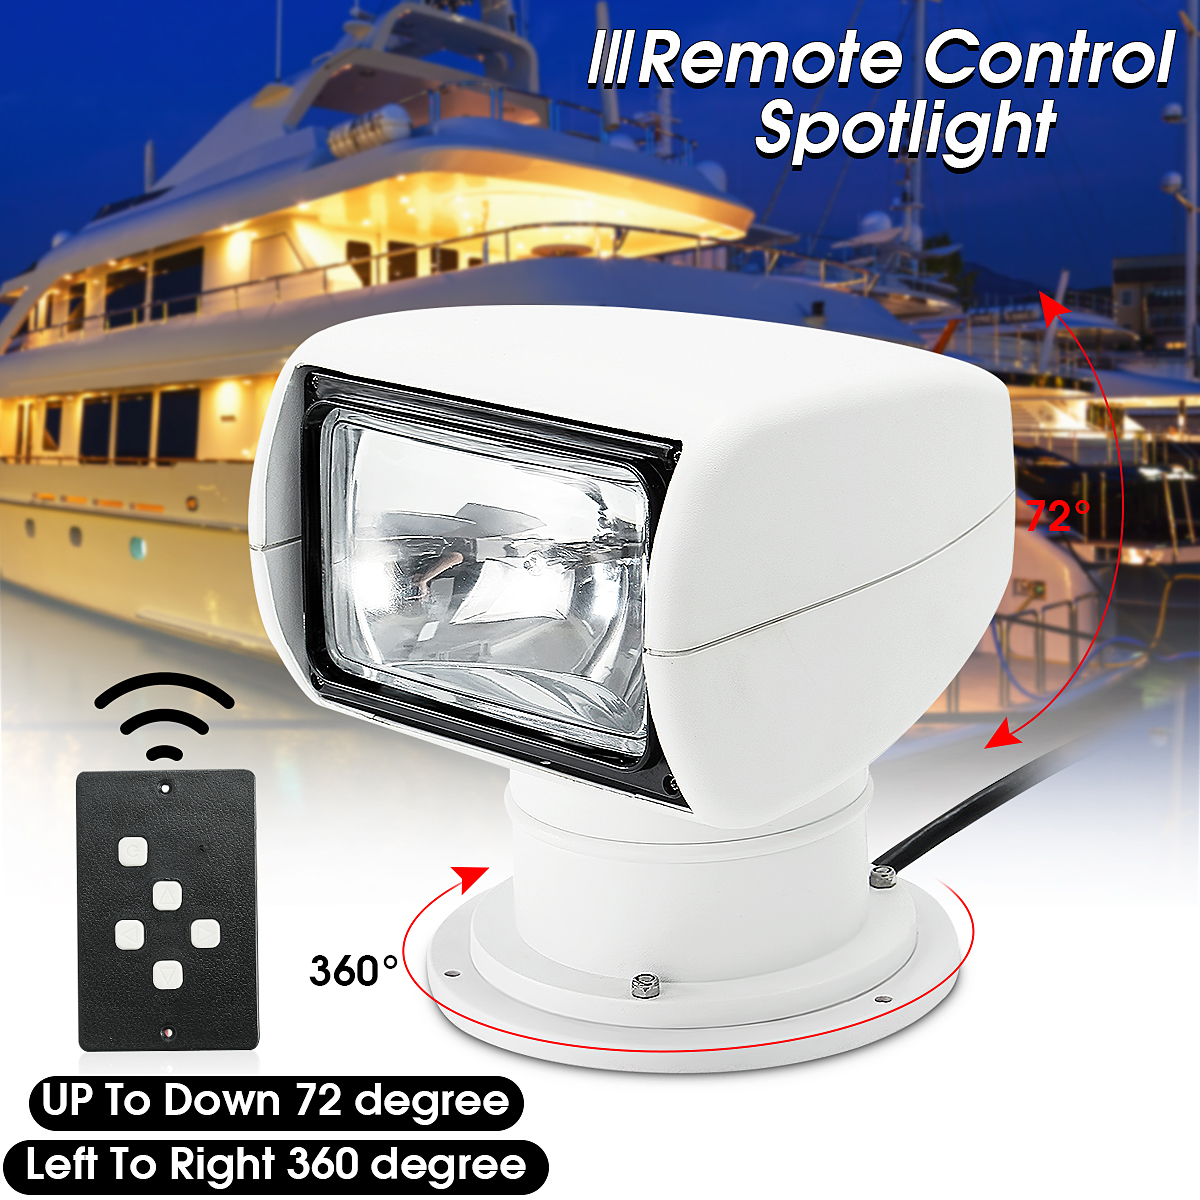 Remote Control Spotlight SUV Car Marine Remote Searchlight 12V 100W Bulb Special